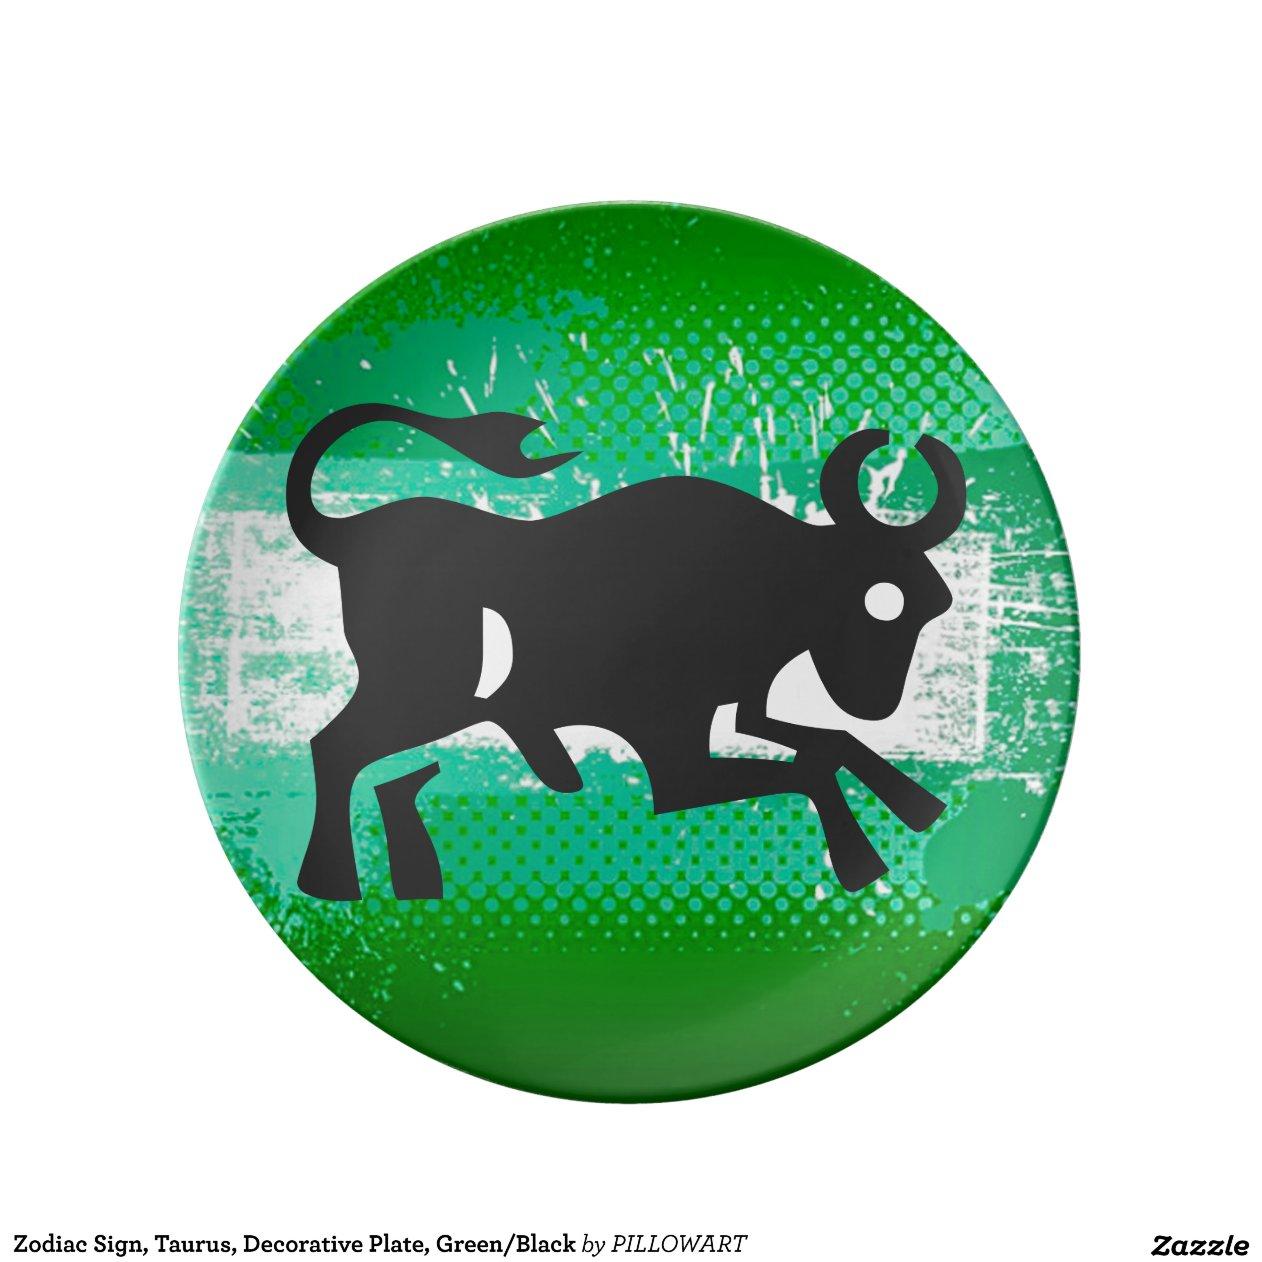 Zodiac Sign Taurus Zodiac Sign Taurus Decorative Plate Green Black Porcelain